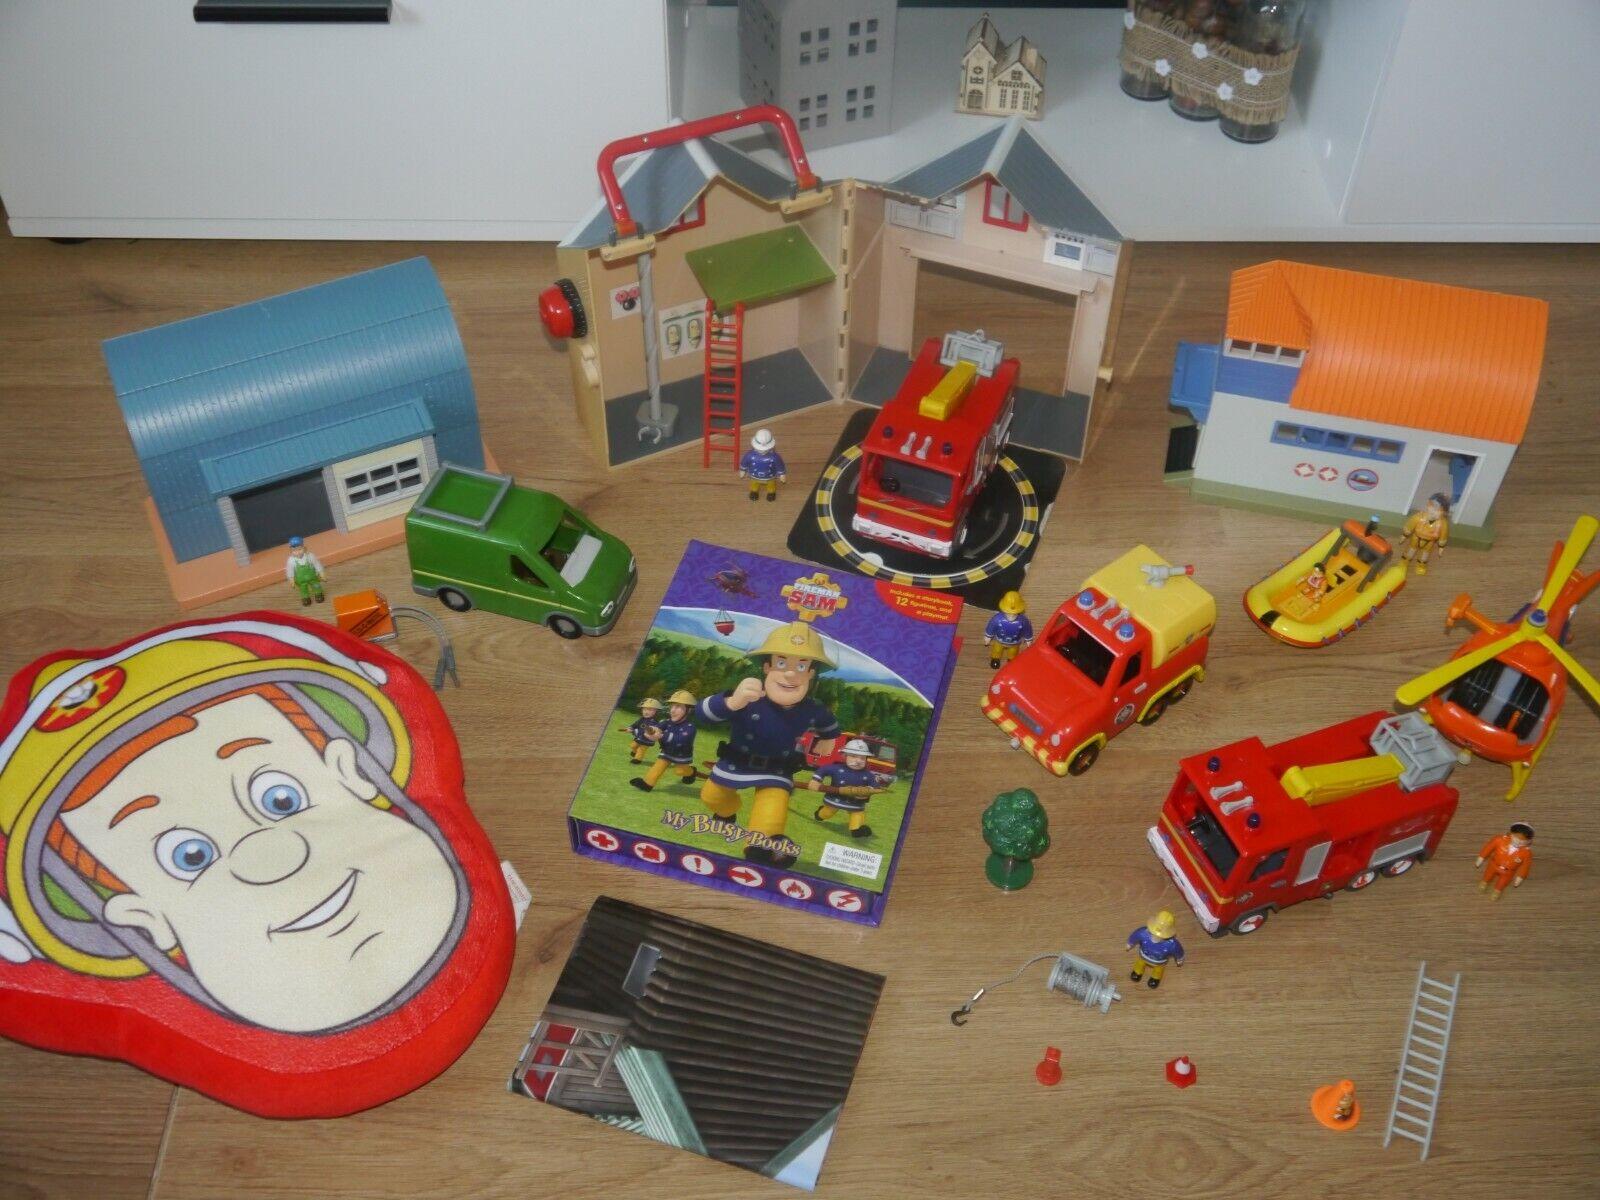 Fireman Sam Large Bundle Toys_3 Buildings_6 Vehicles_6 Figures & Many More_12